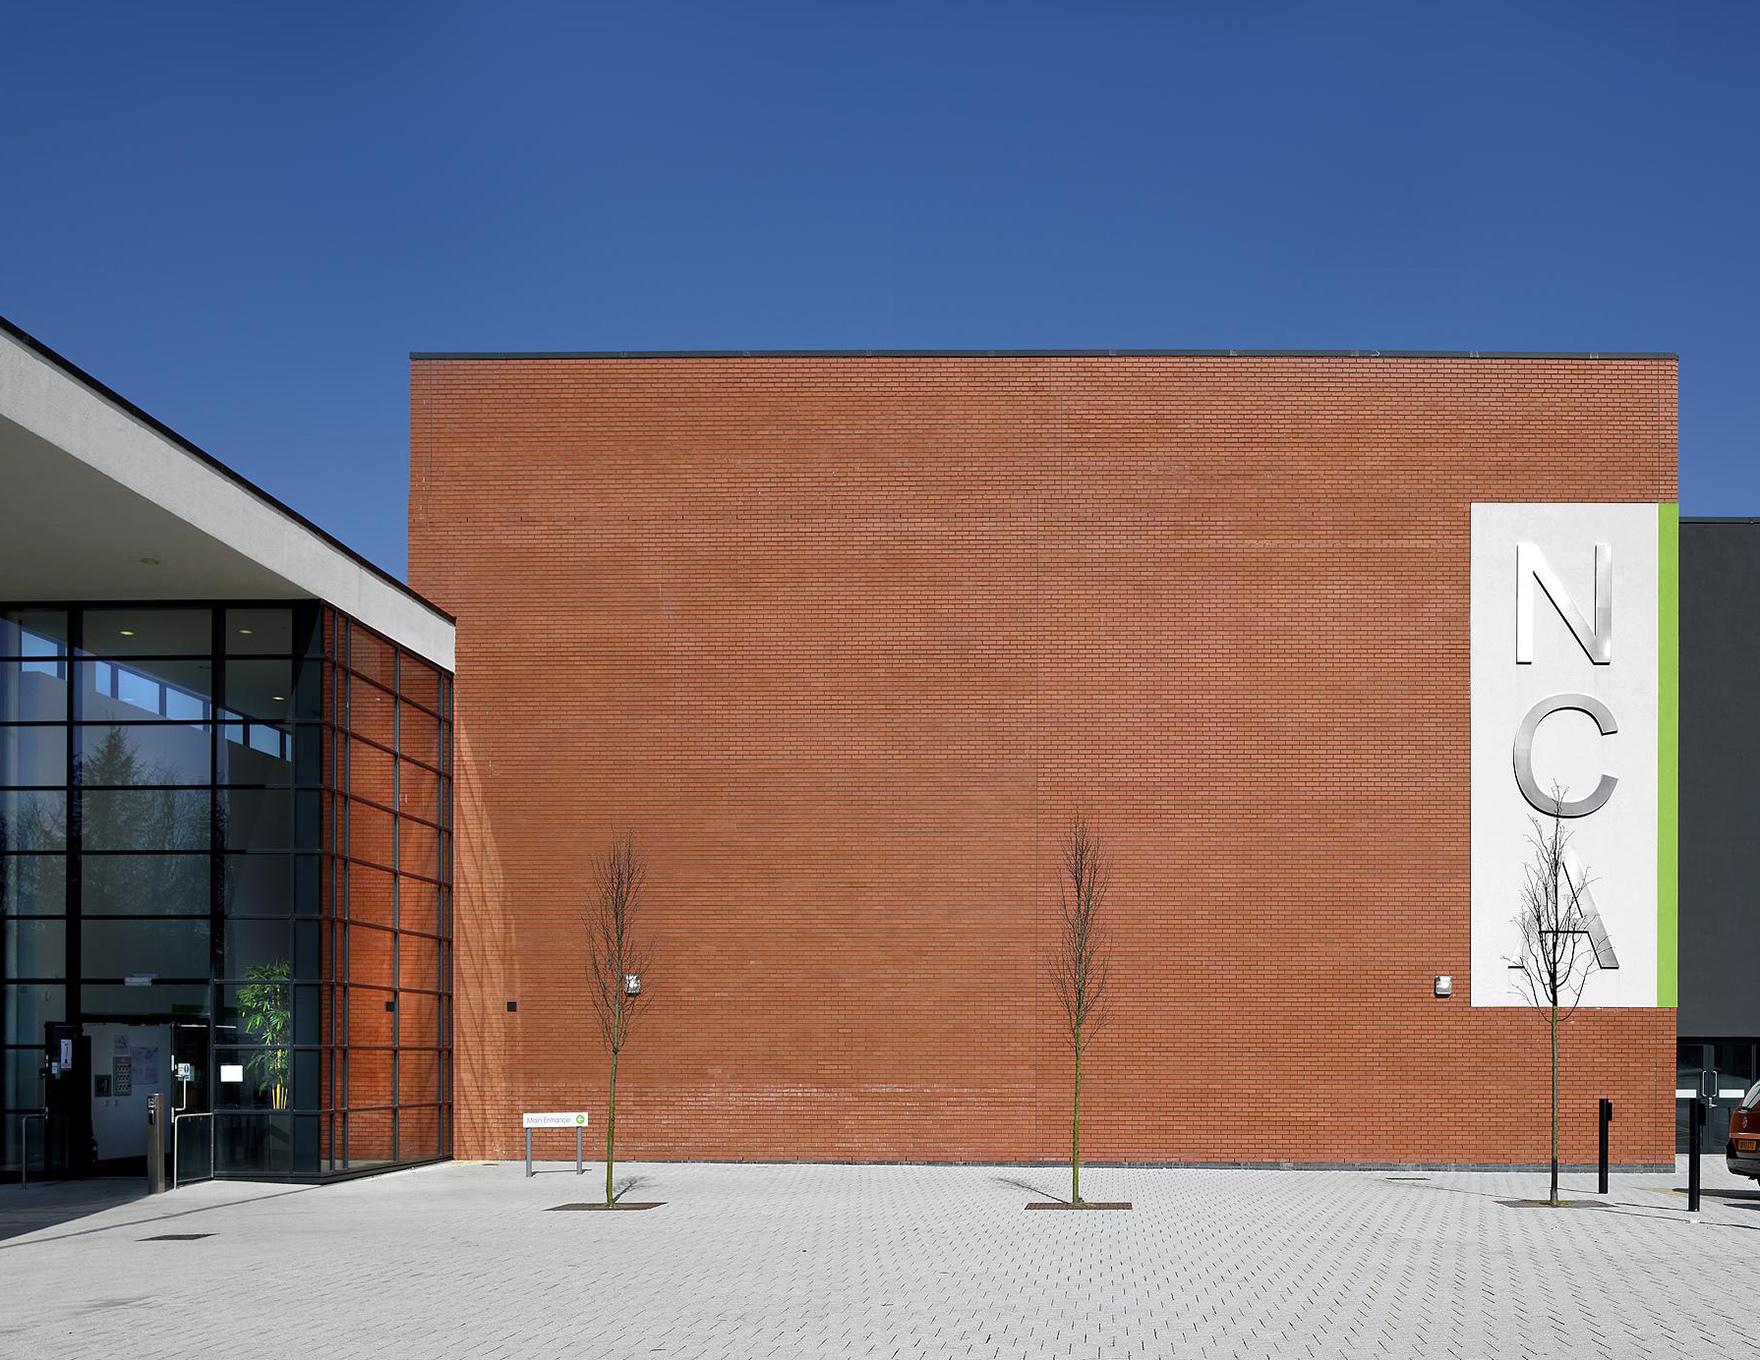 Ashton Campus Tameside School Entrance Plaza L